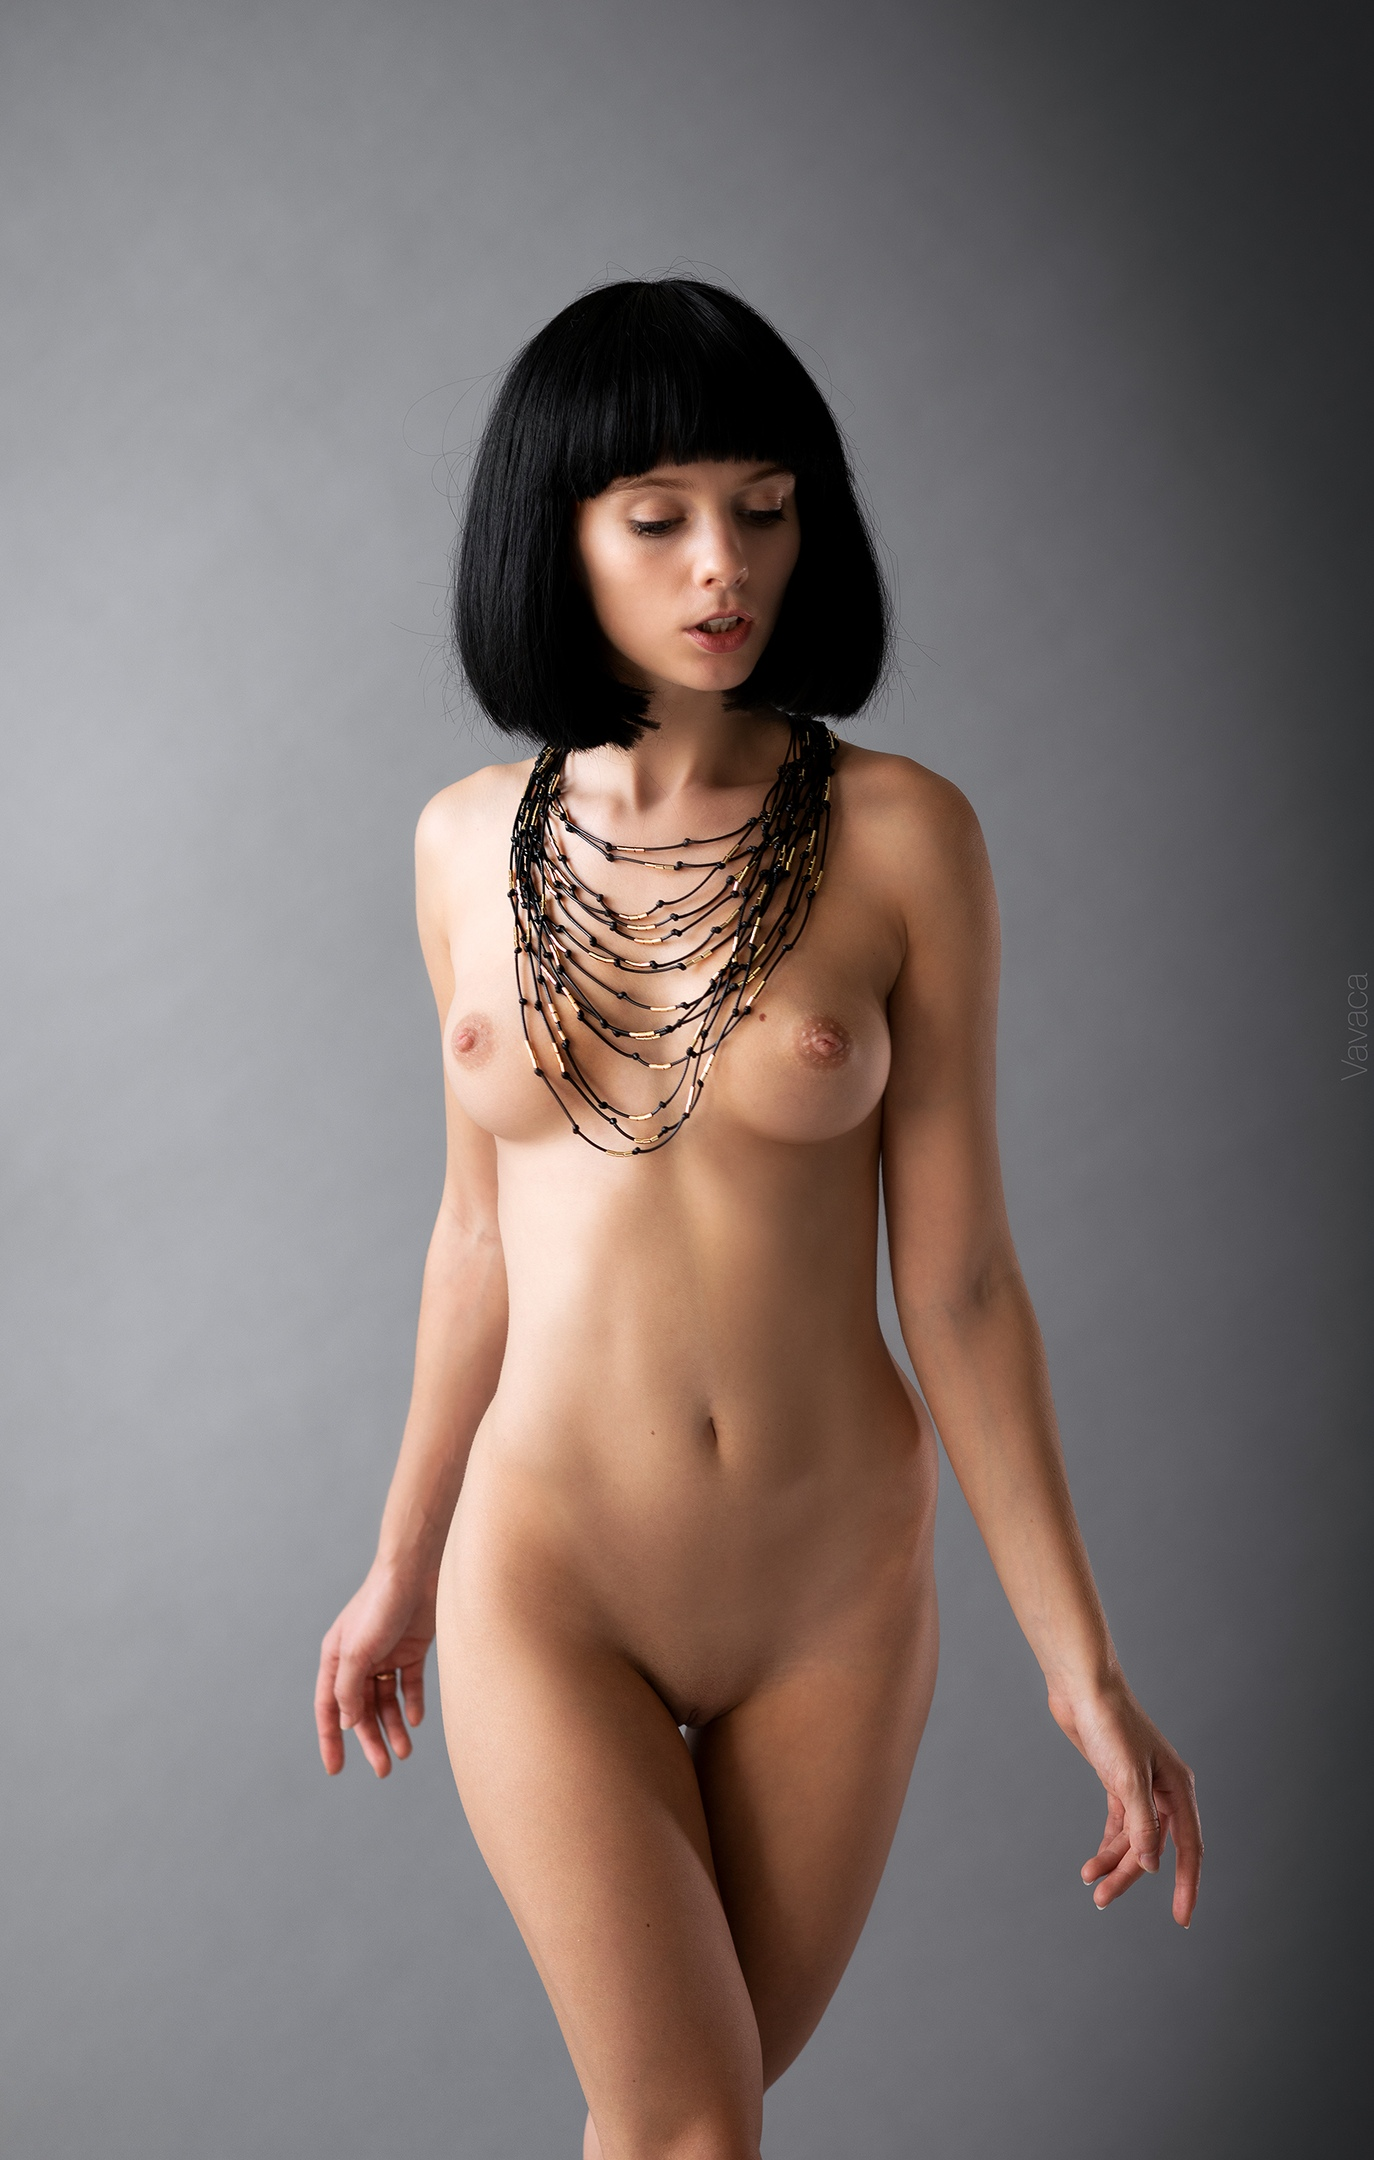 Actriz Porno Marta marta gromova porn pic - eporner